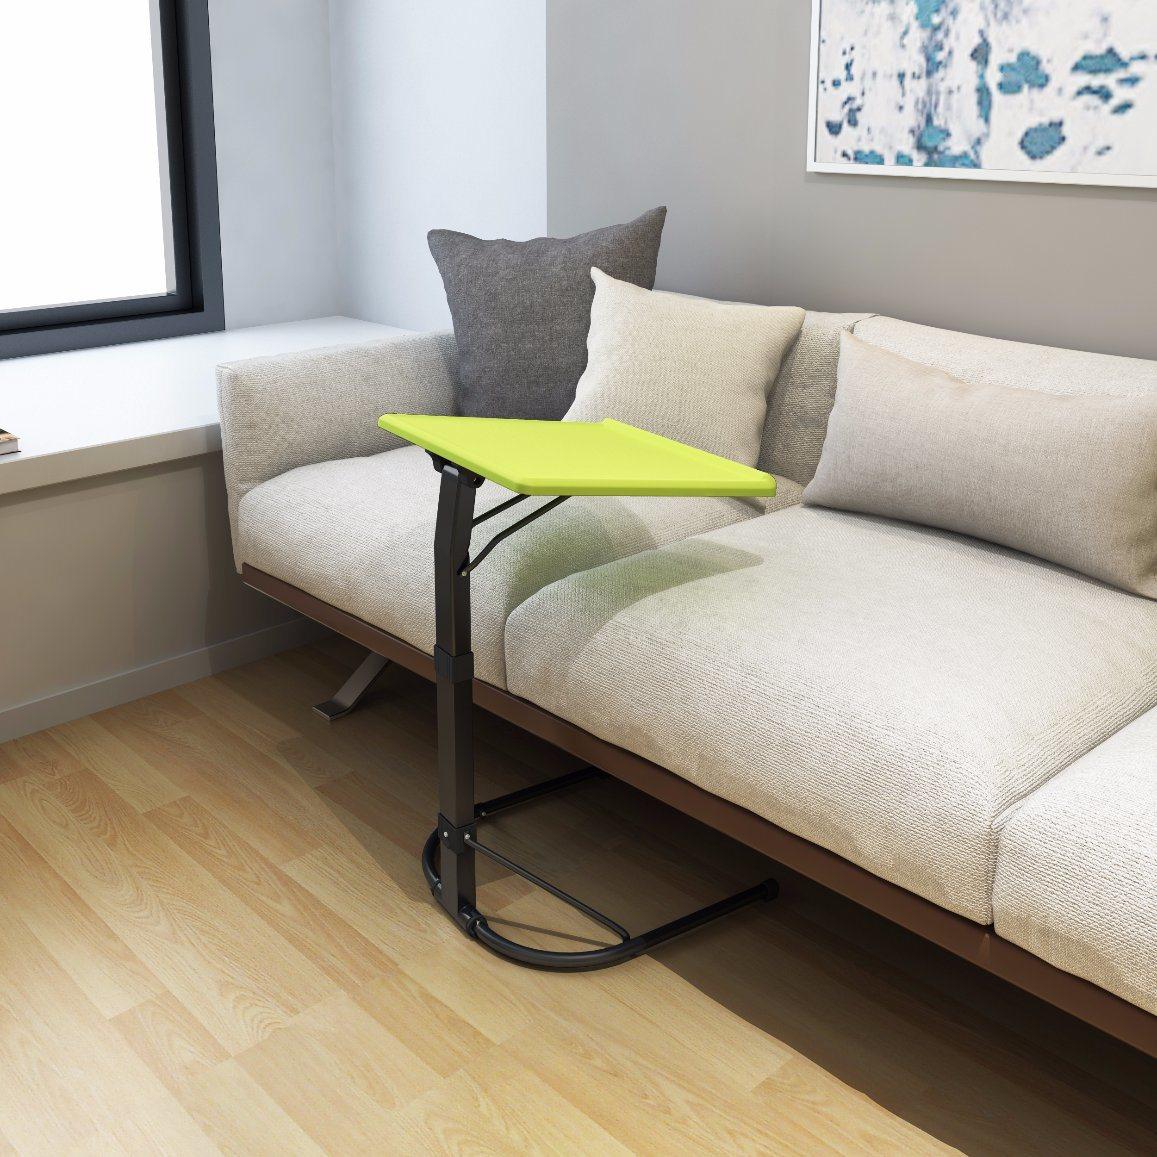 [Hot Item] Plastic Foldable Modern Living Room Furntiure Sofa Side Table